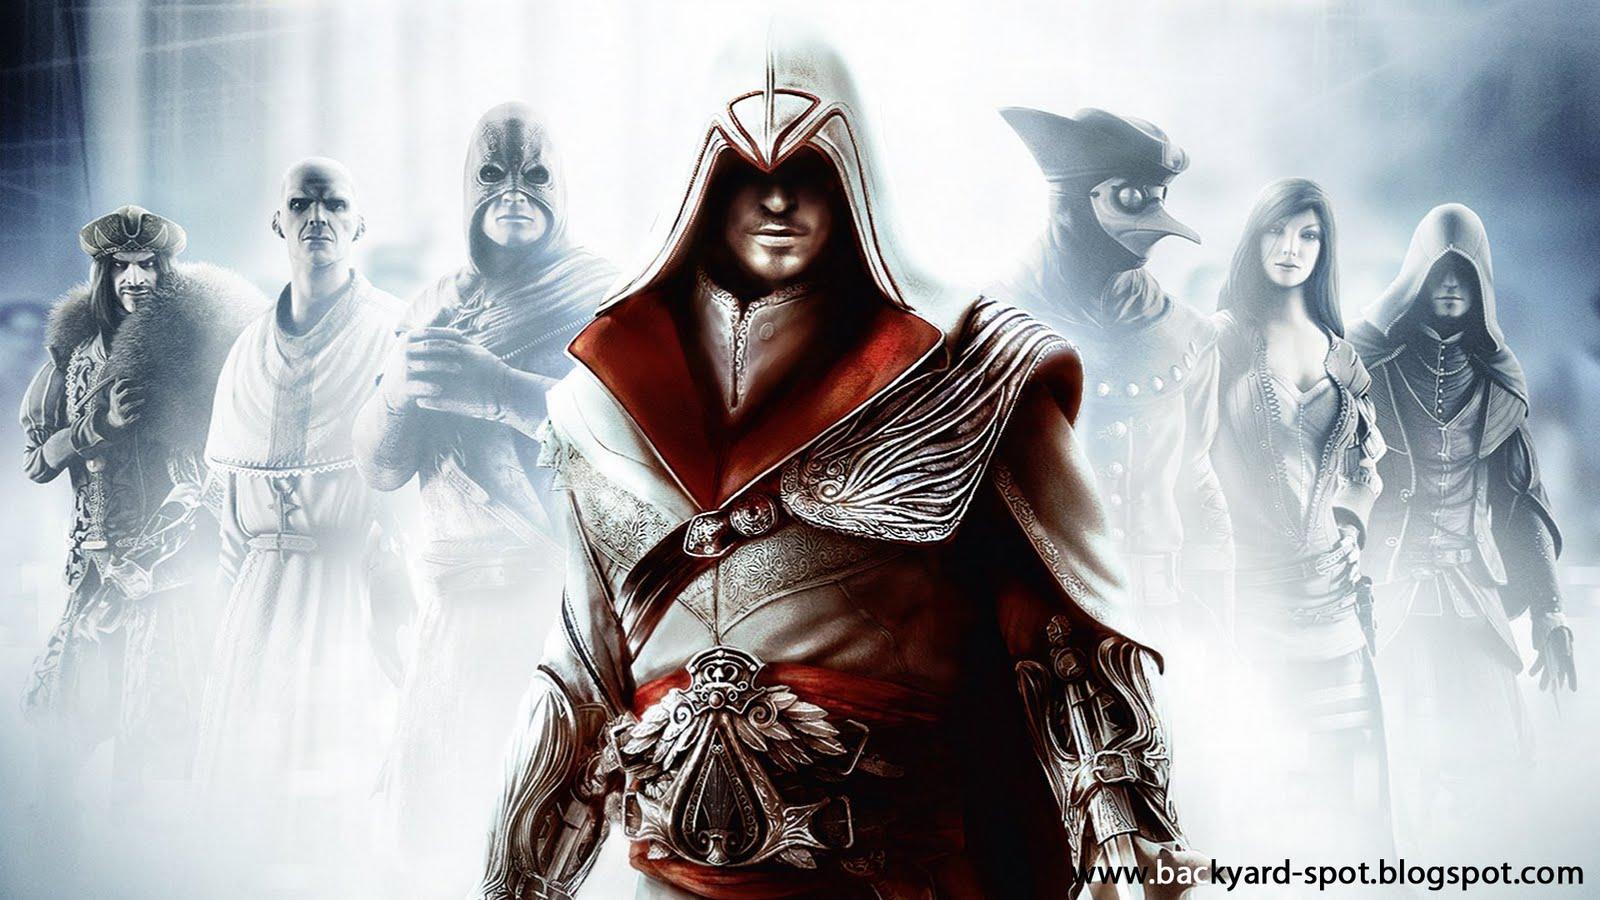 Assassins Creed Brotherhood Wallpaper: The Backyard Spot: Assassin's Creed: Brotherhood